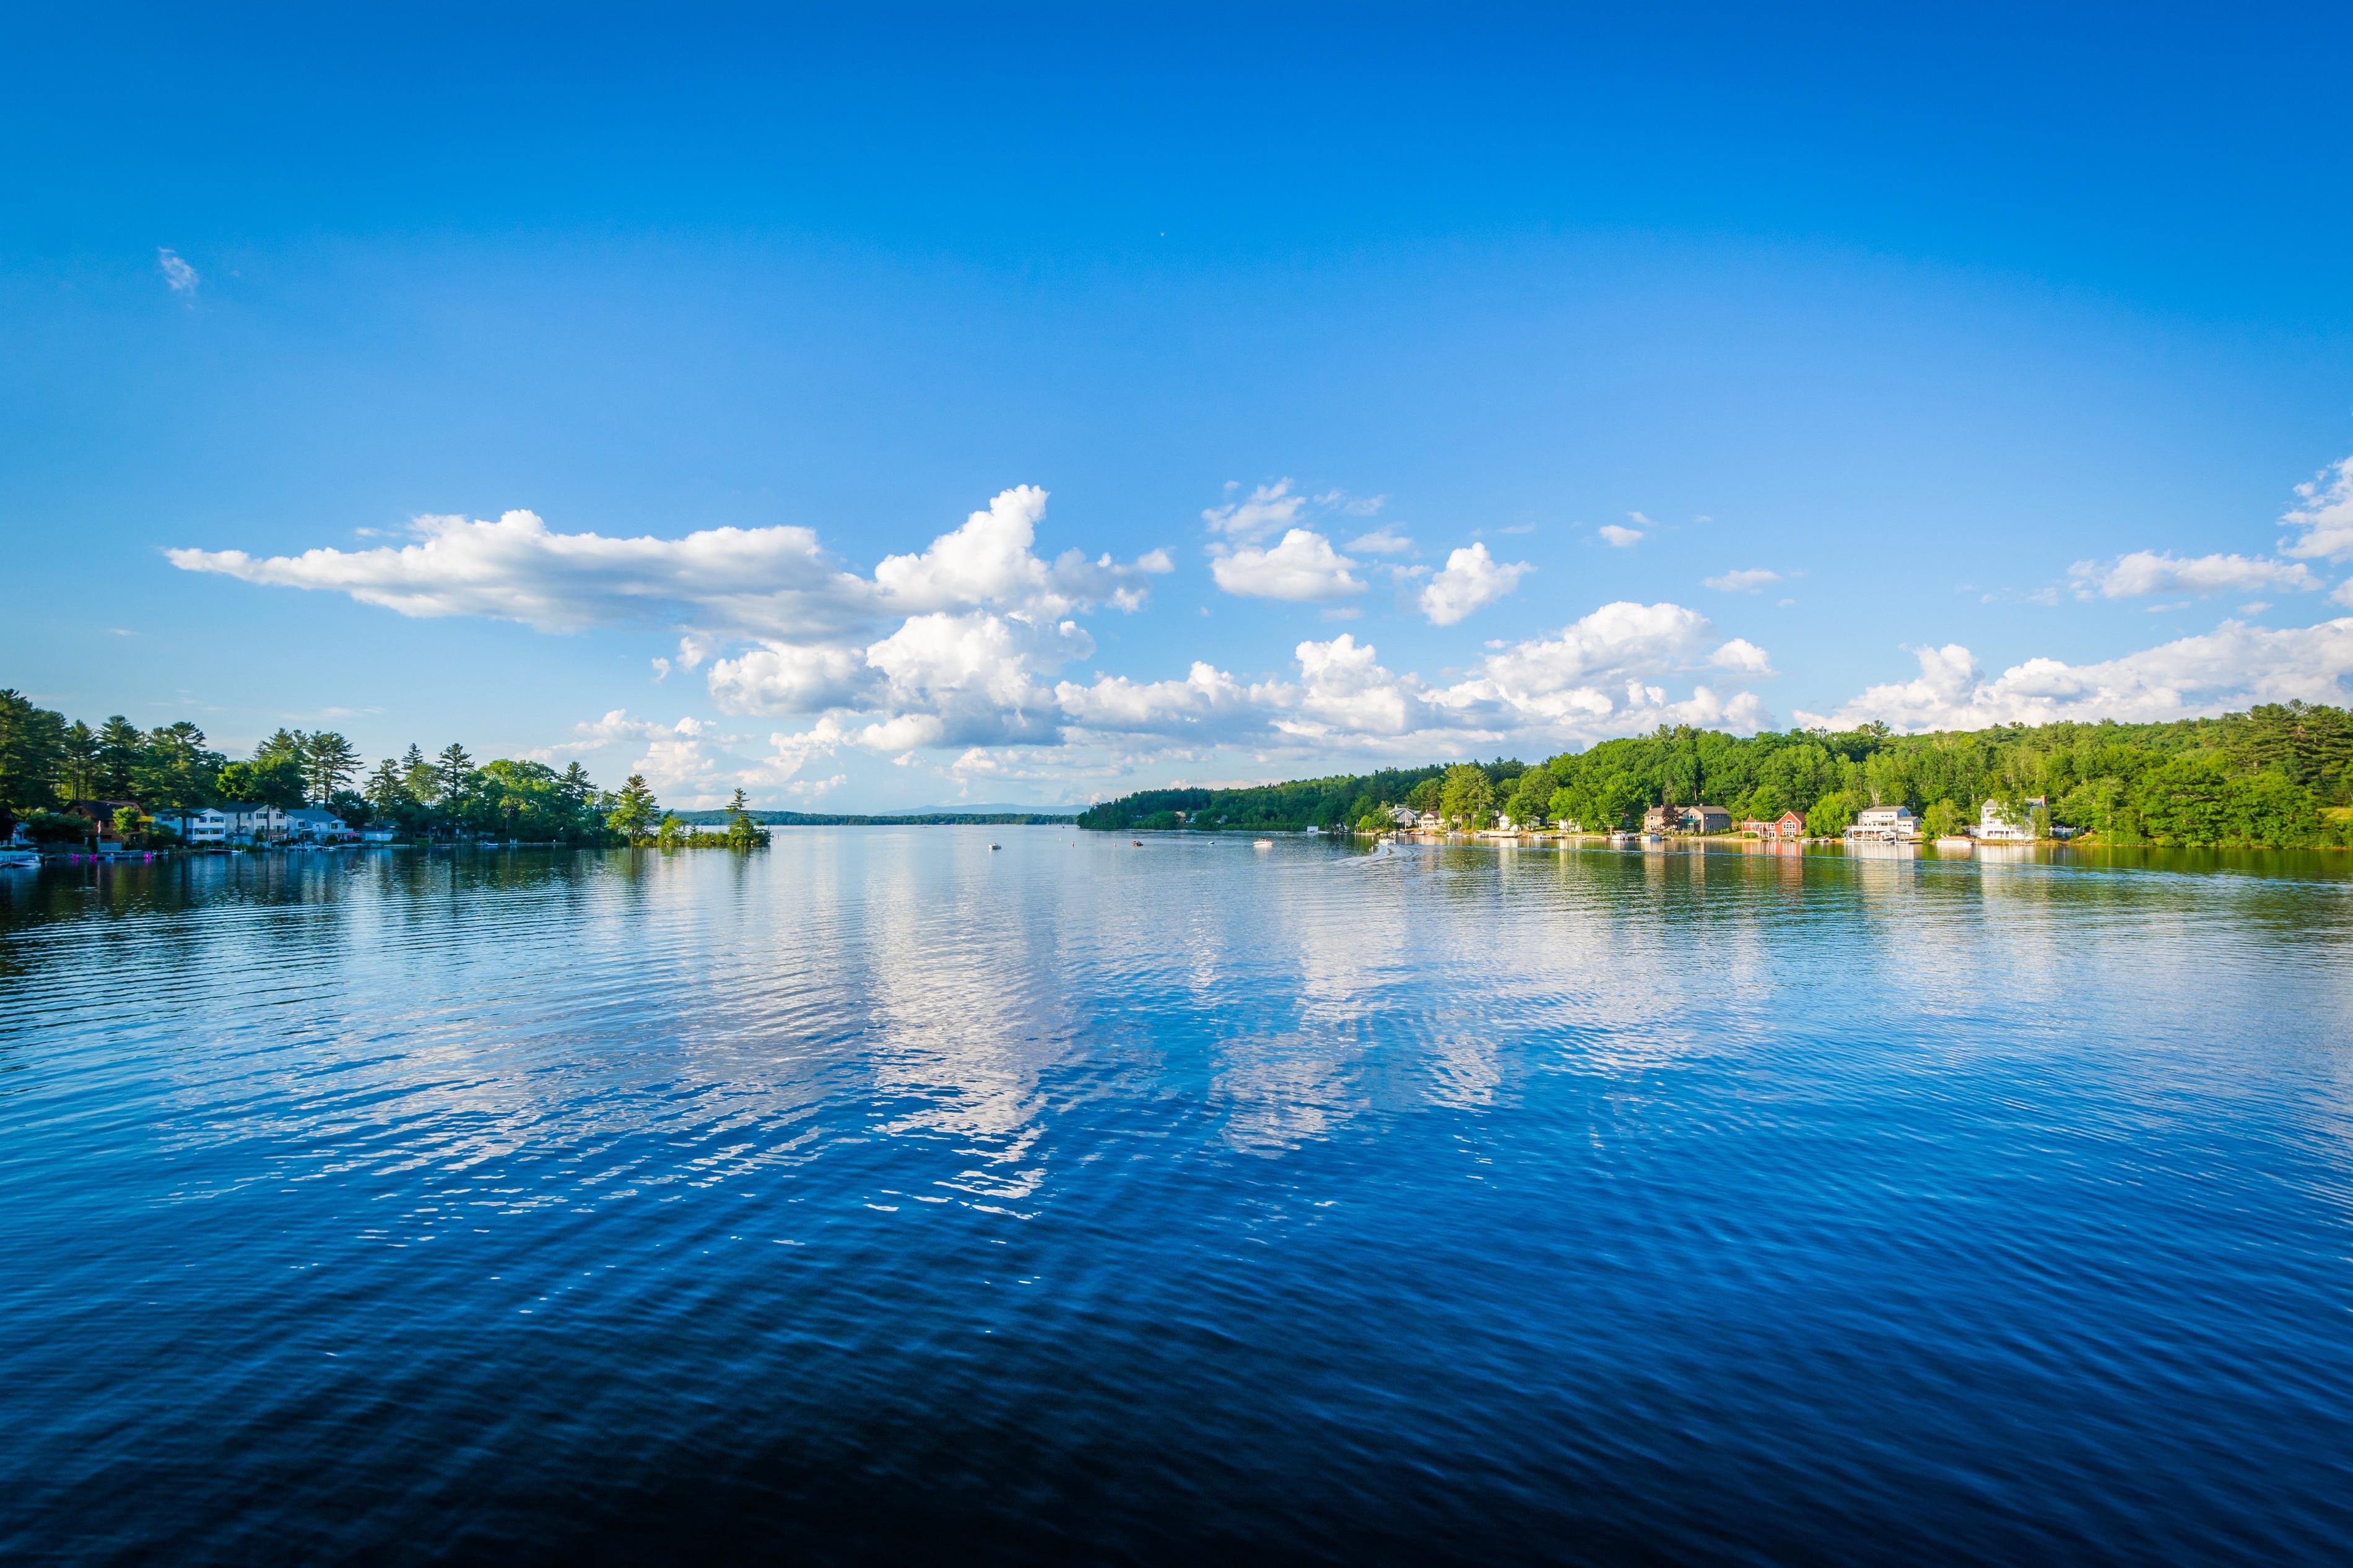 Lake Winnisquam, Laconia, New Hampshire, United States of America